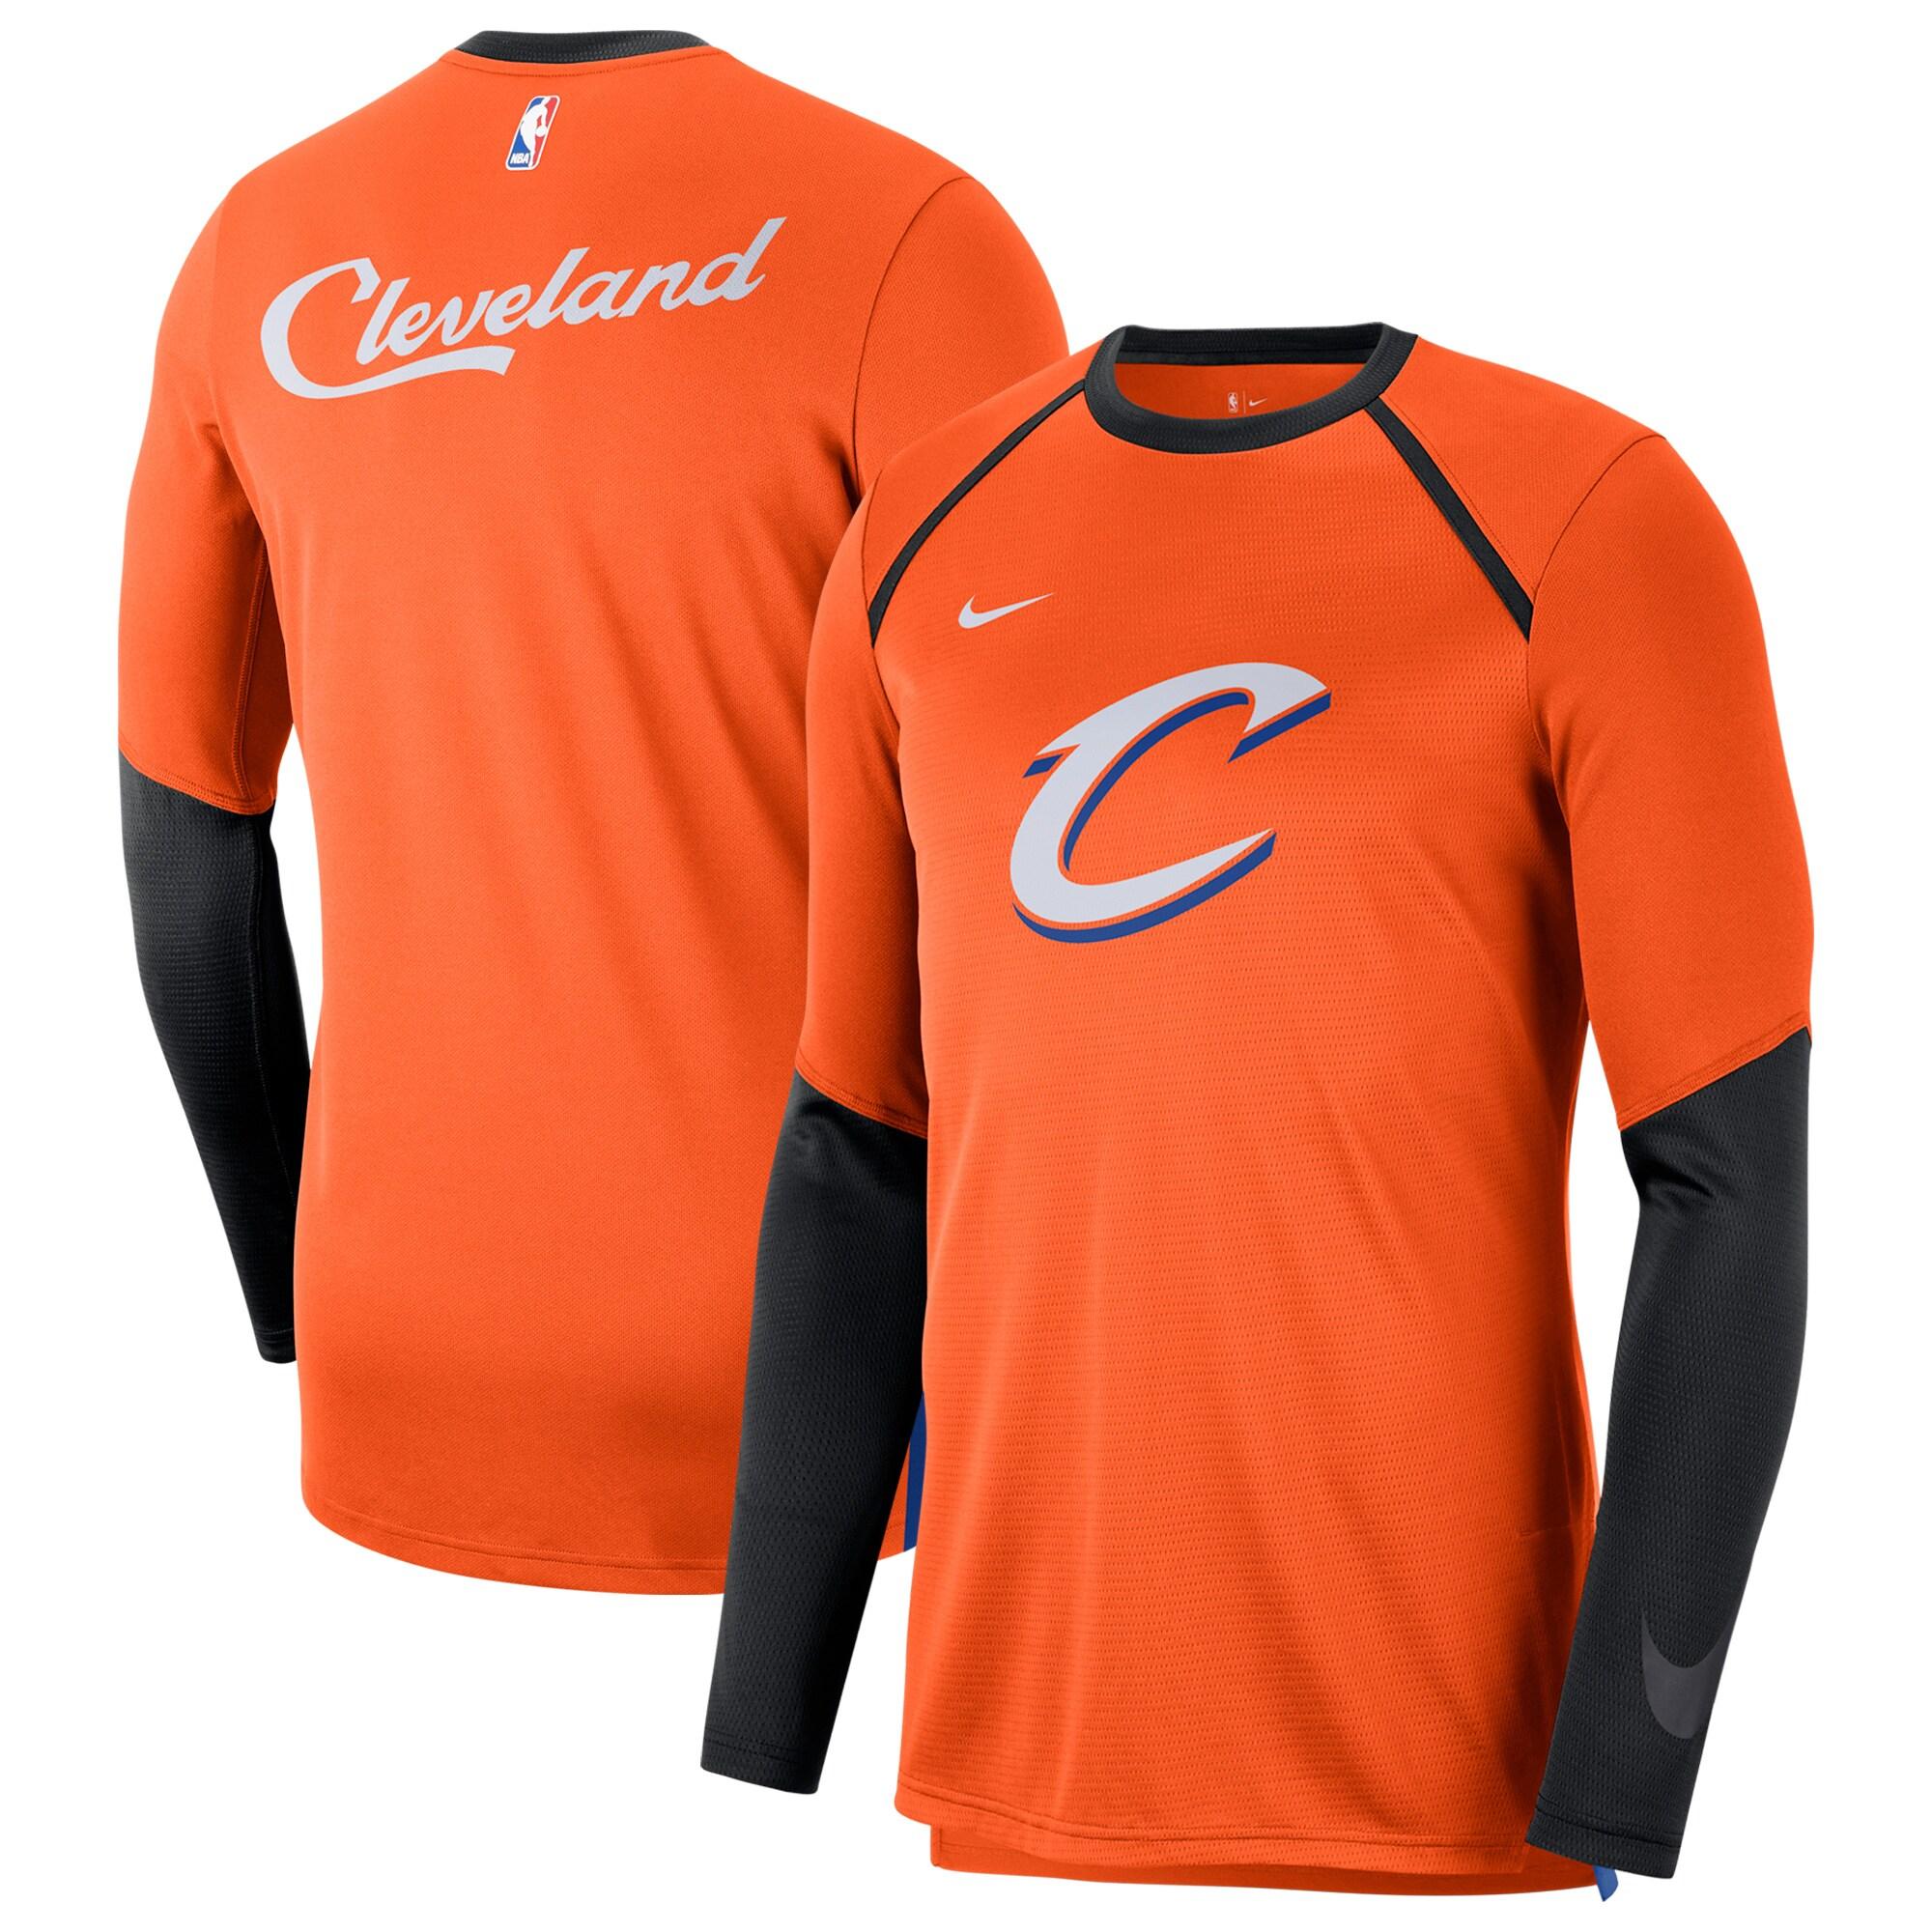 Cleveland Cavaliers Nike City Edition Long Sleeve Shooting T-Shirt - Orange